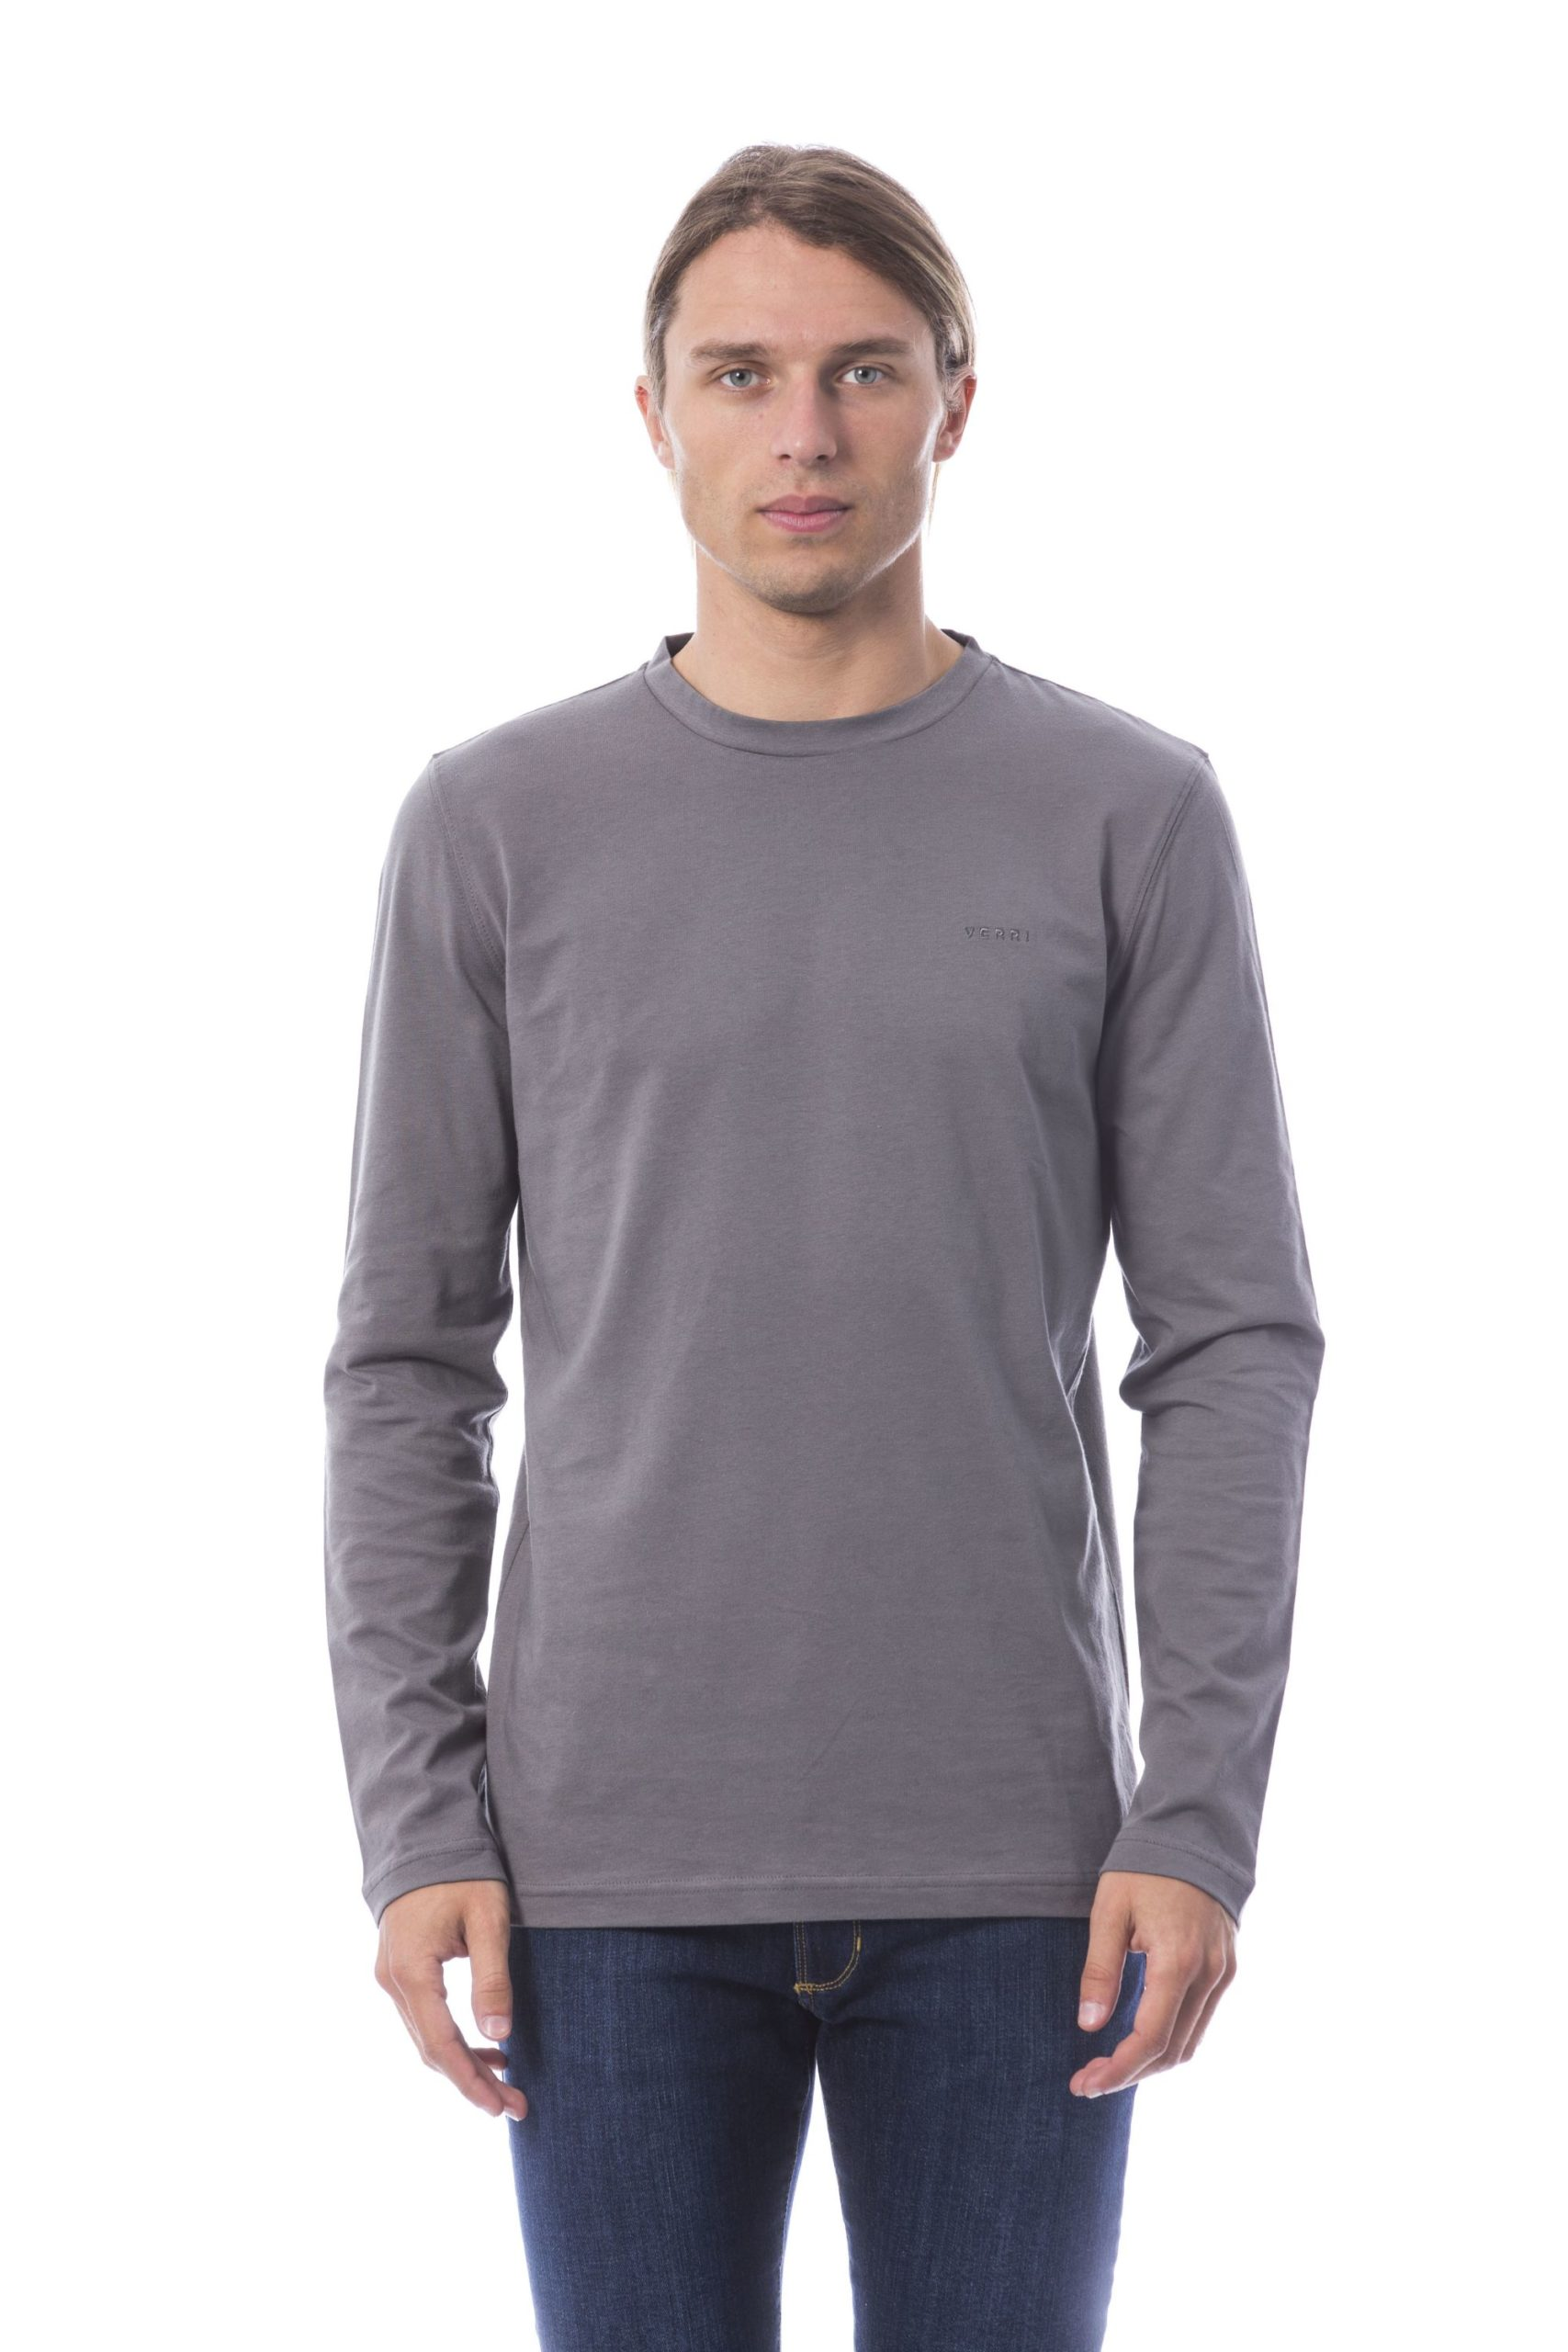 Verri Men's Vgrigiochiaro T-Shirt Gray VE678975 - XL